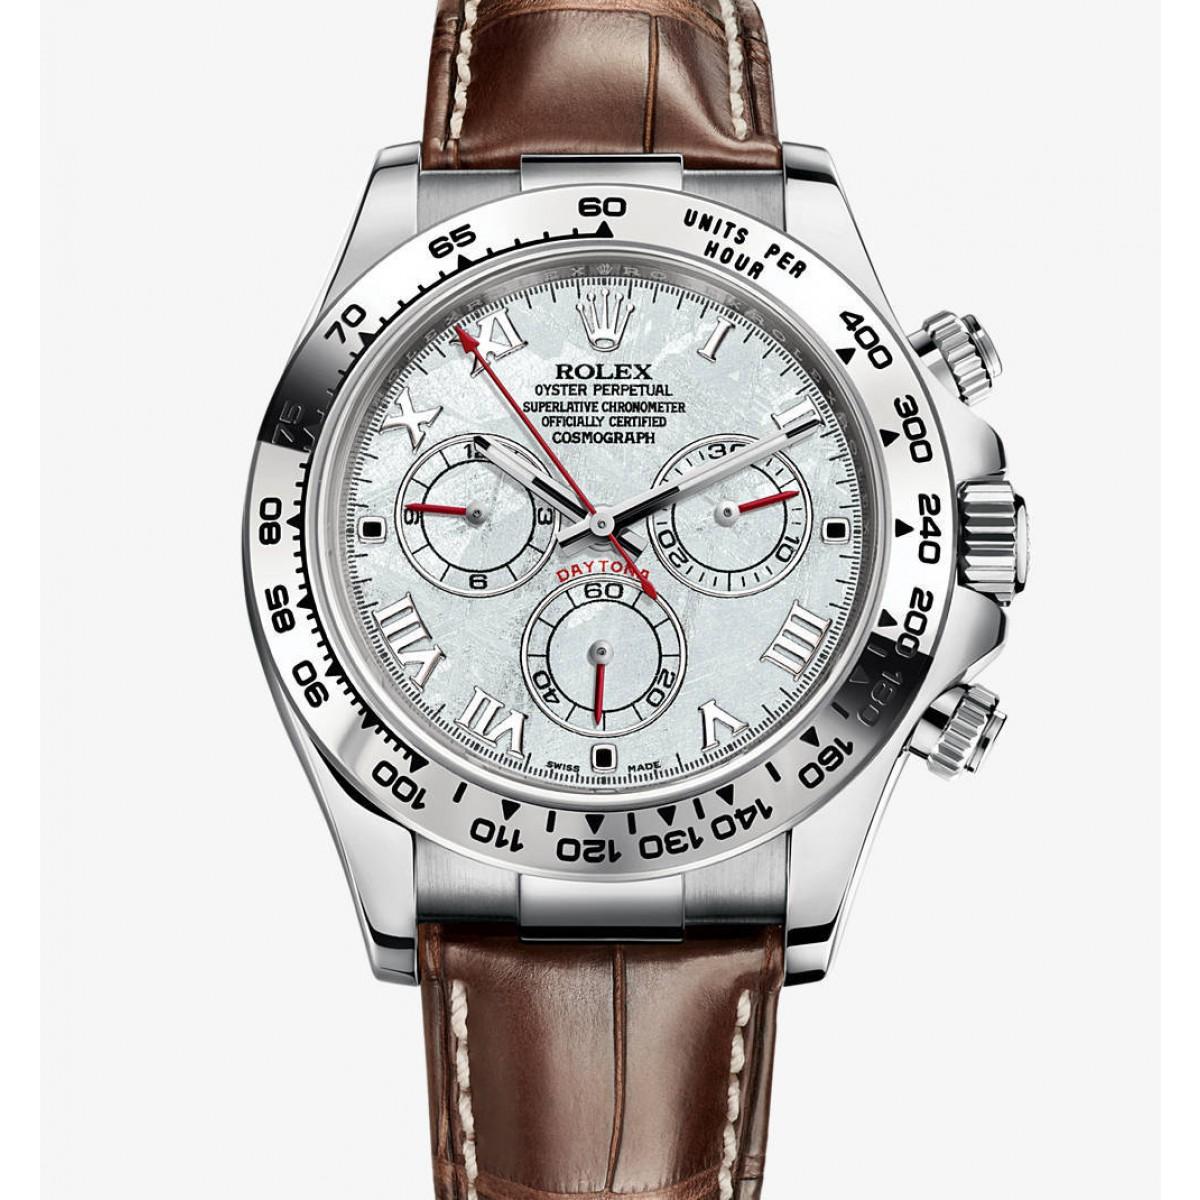 062133ecf60 Relógio Réplica Rolex Cosmograph Daytona Silver